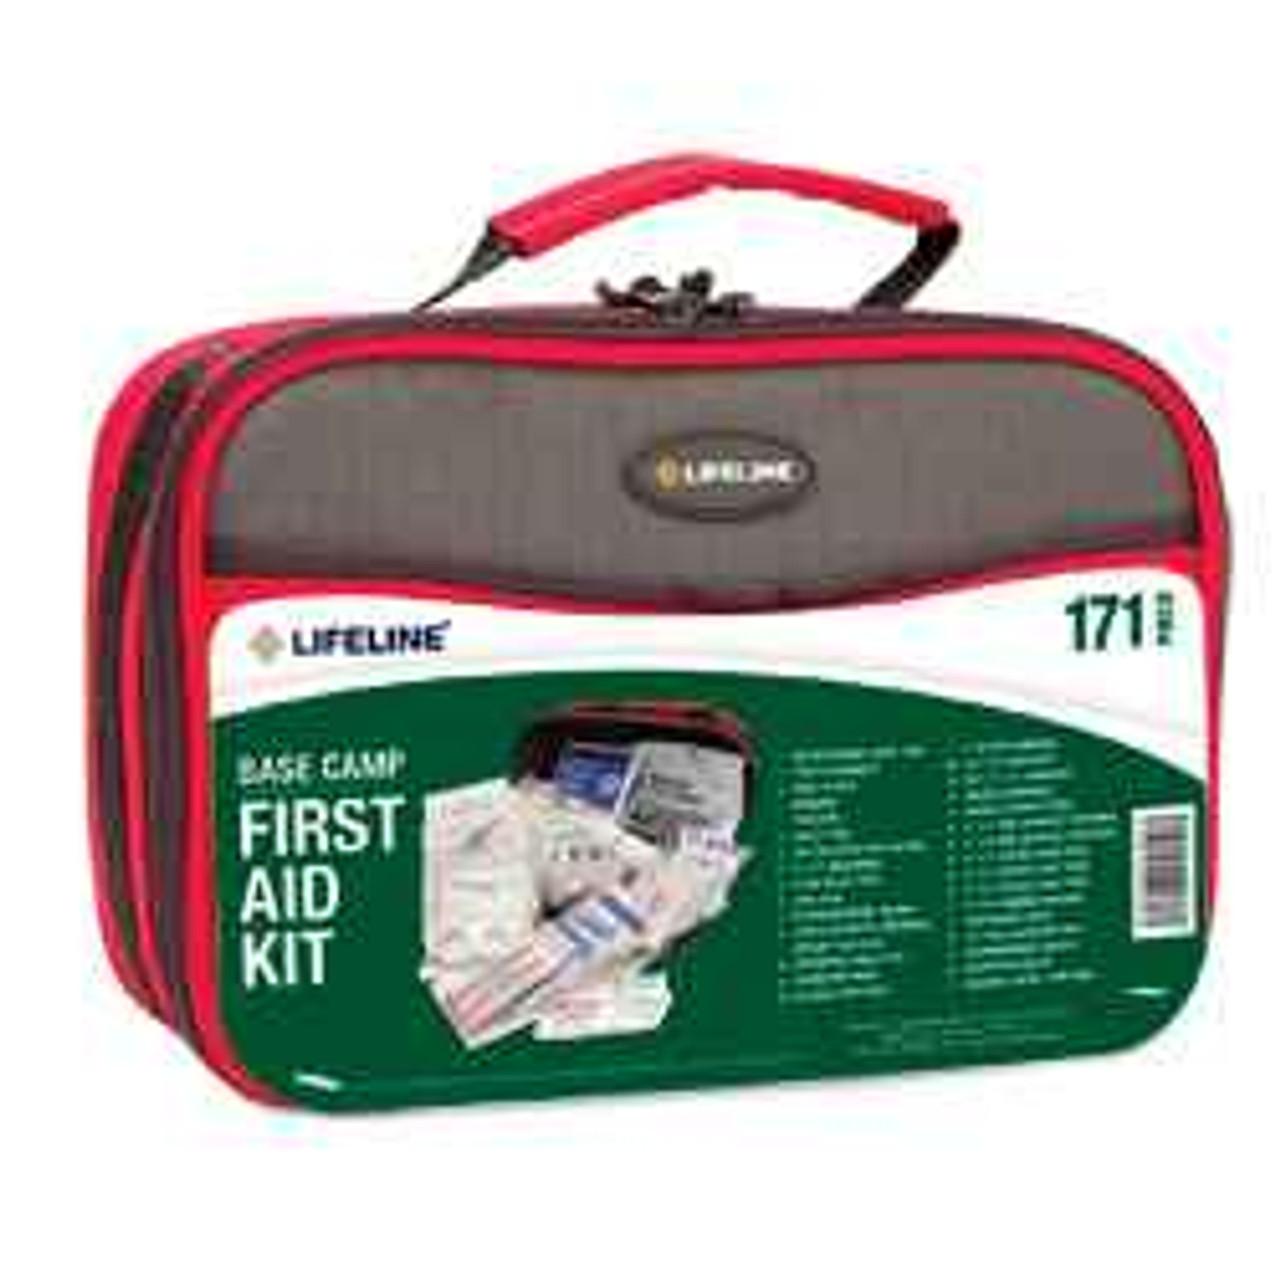 LifeLine Base Camp First Aid Kit